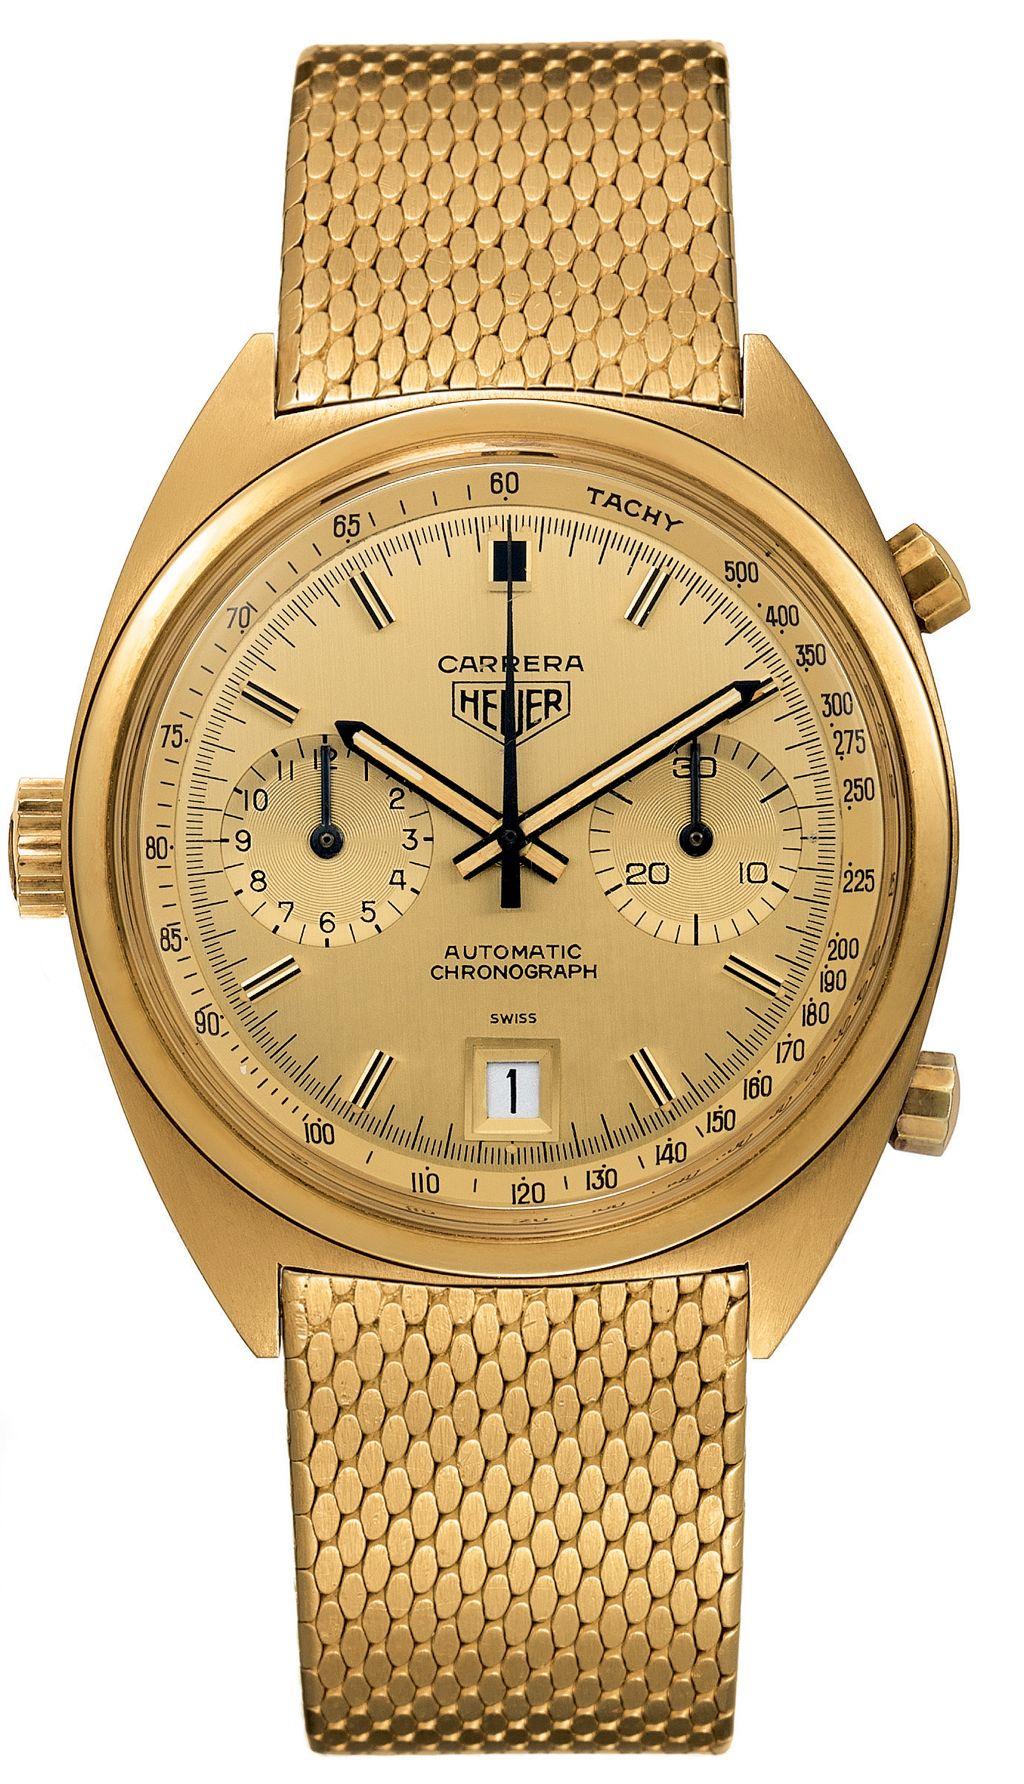 Carrera Gold - 1972